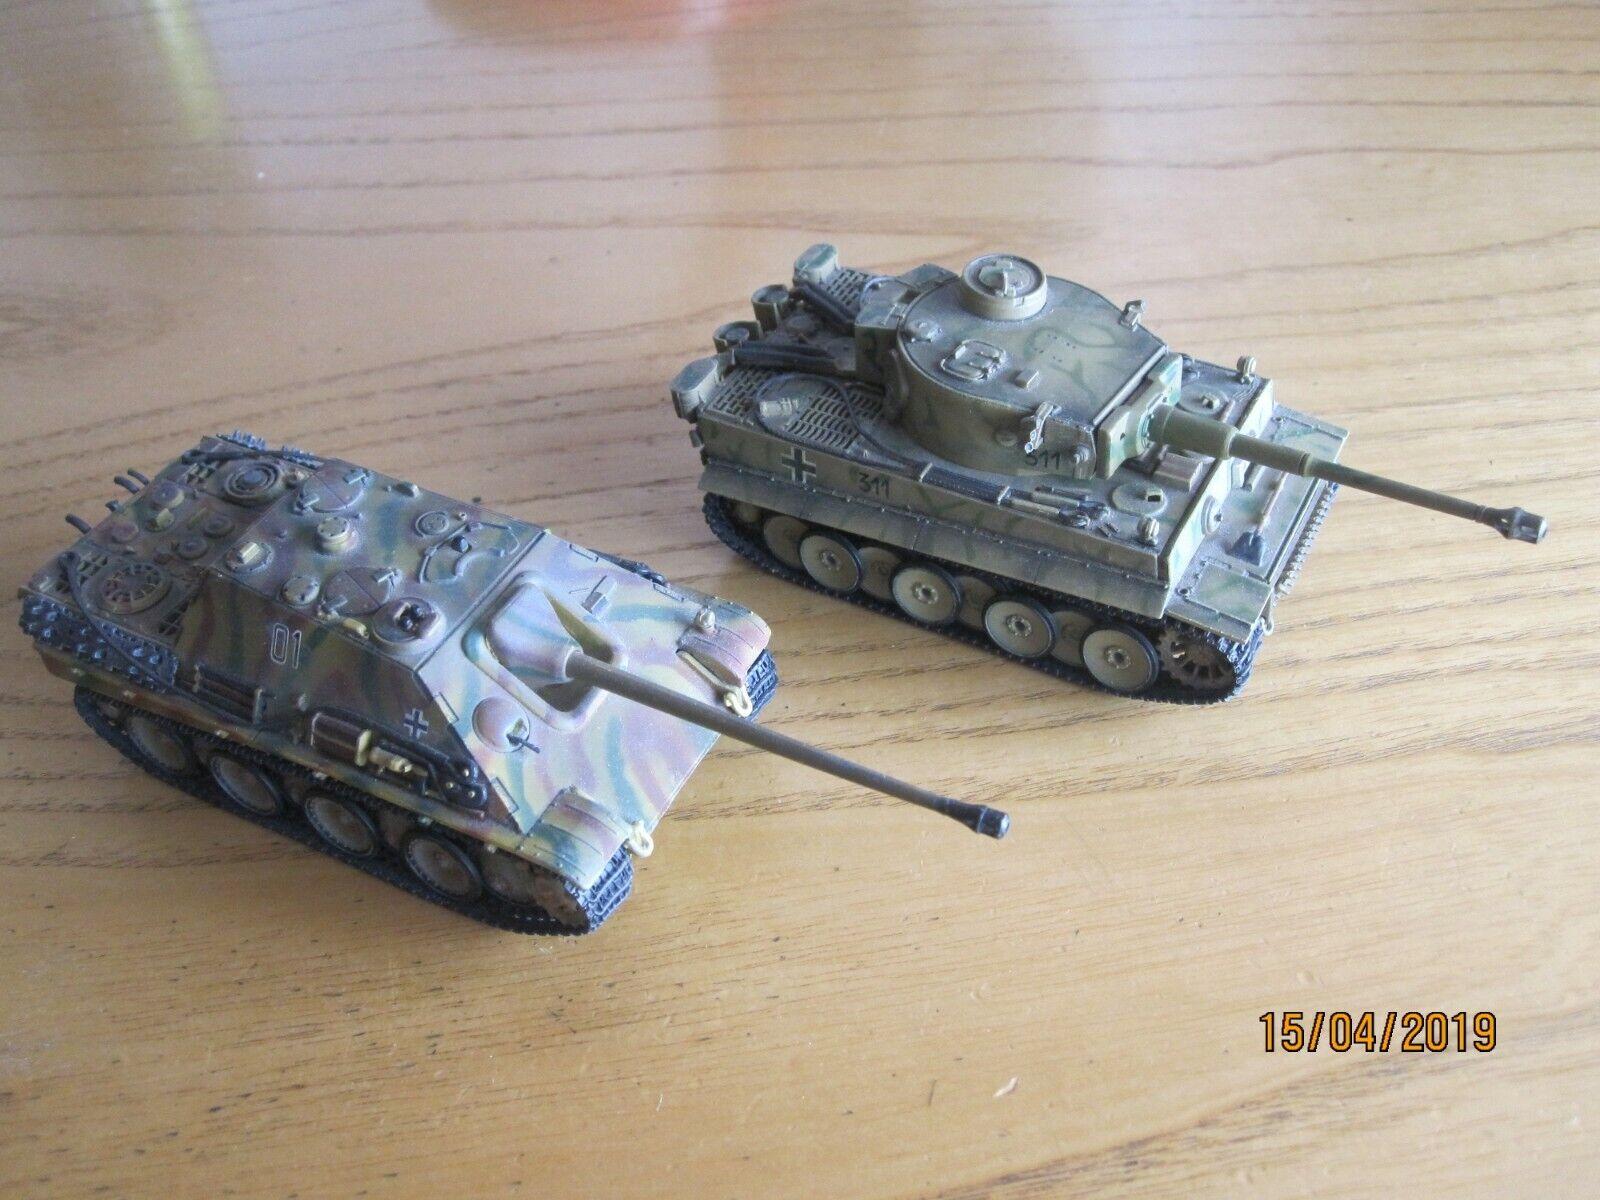 1/72 DRAGON ARMOR - GERMAN: JAGDPANTHER 60006 & TIGER1 60002 - WW2 TANK